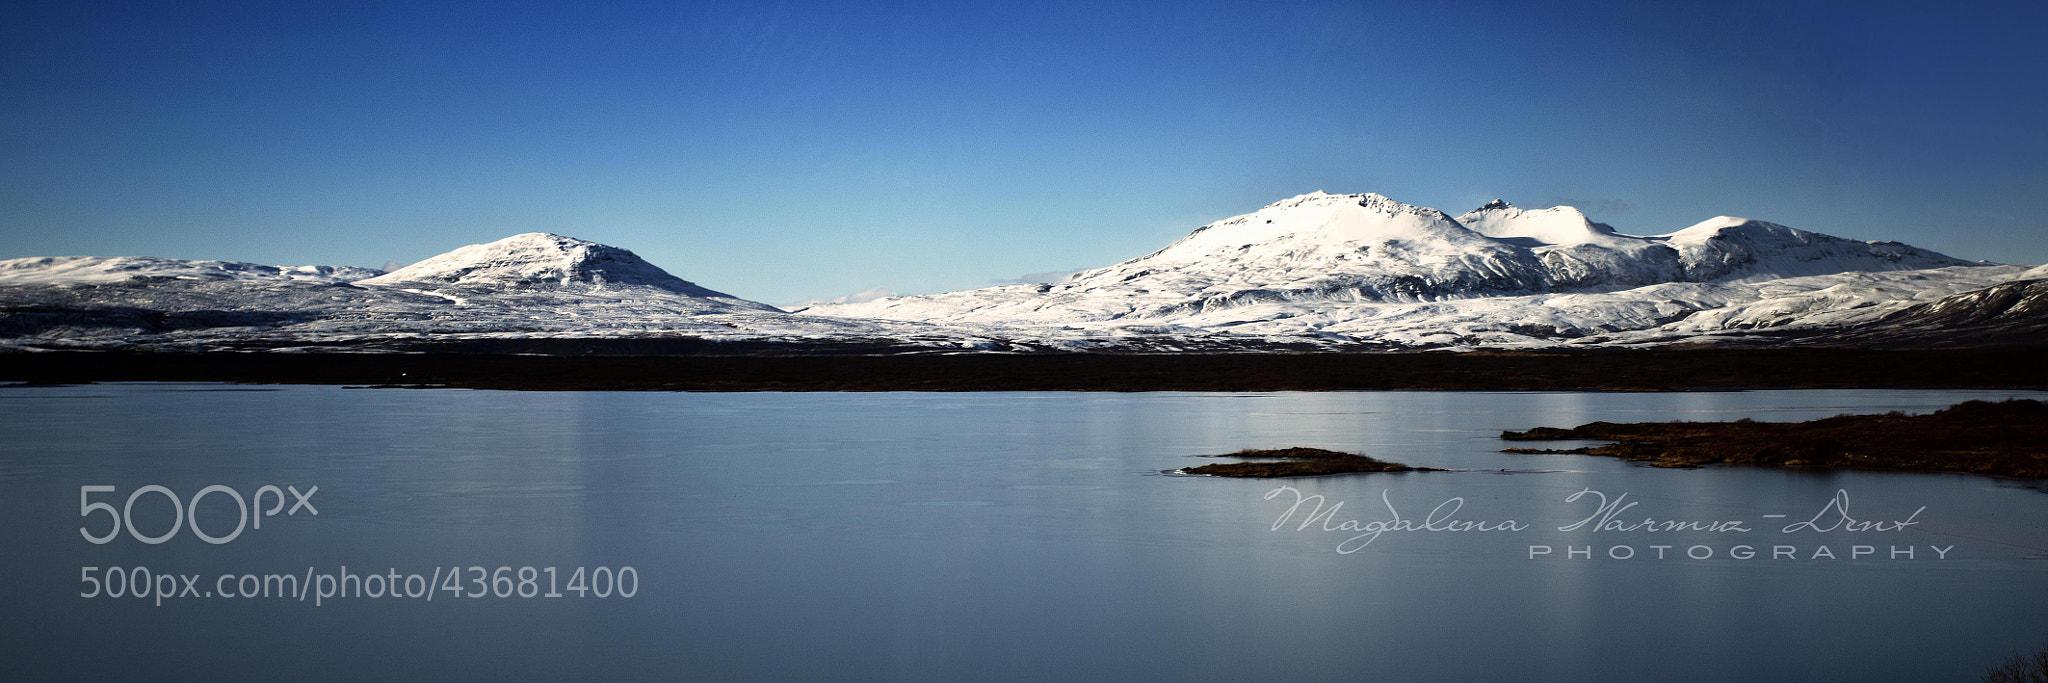 Photograph Thingvellir Panorama by Magdalena Warmuz-Dent on 500px